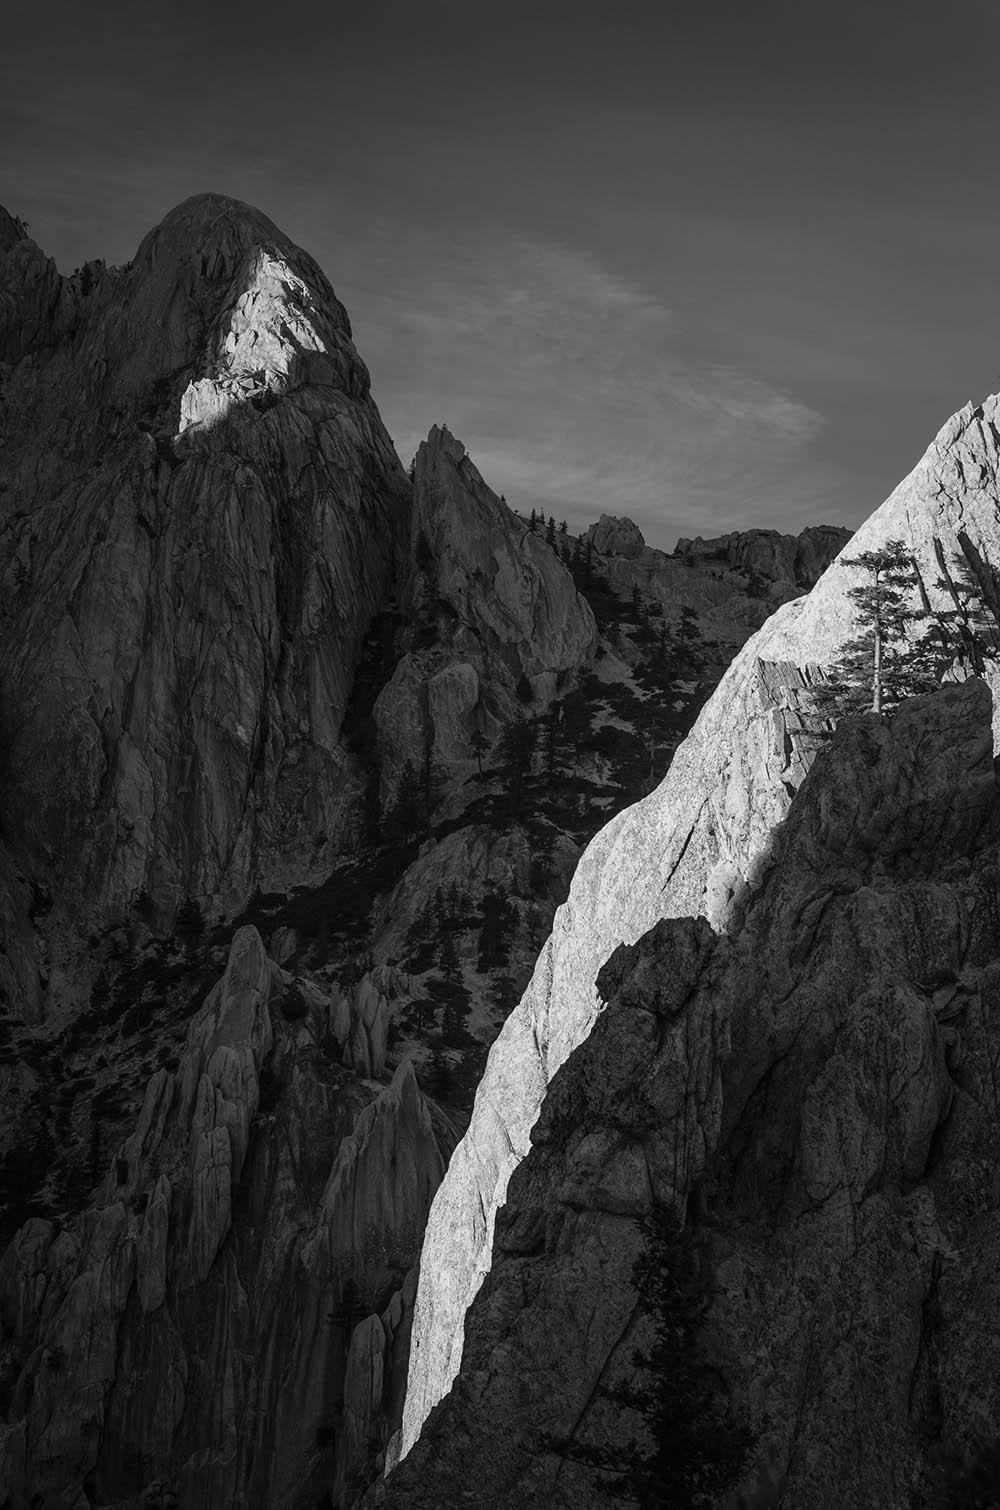 039.1. Istrate Stefan.  Dialog (Castle Crags State Park, SUA)